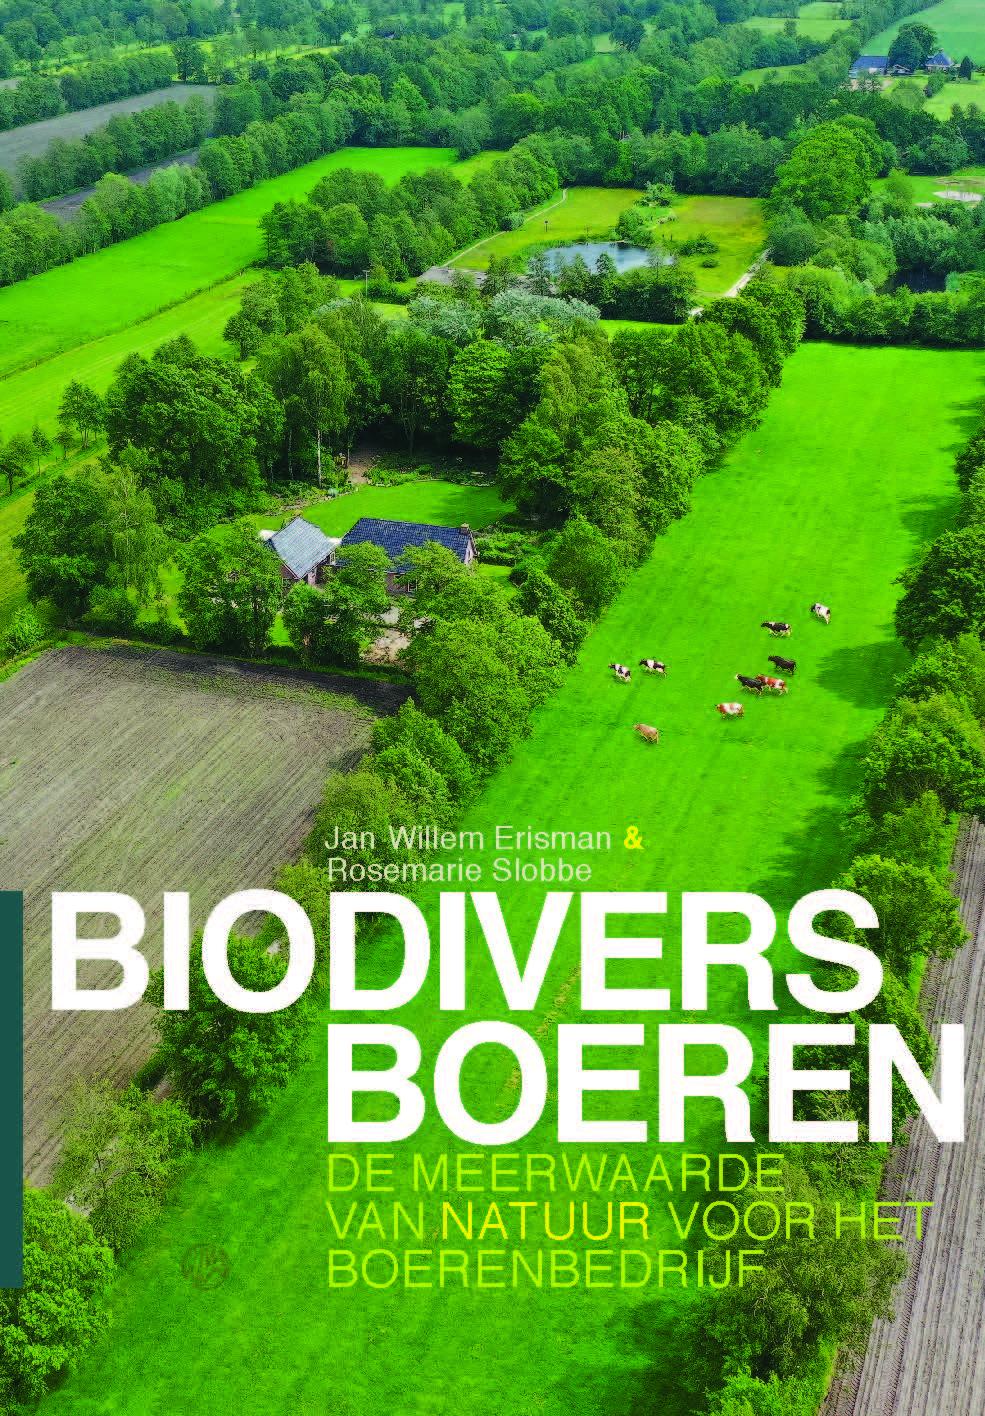 BioDIVERS BOEREN